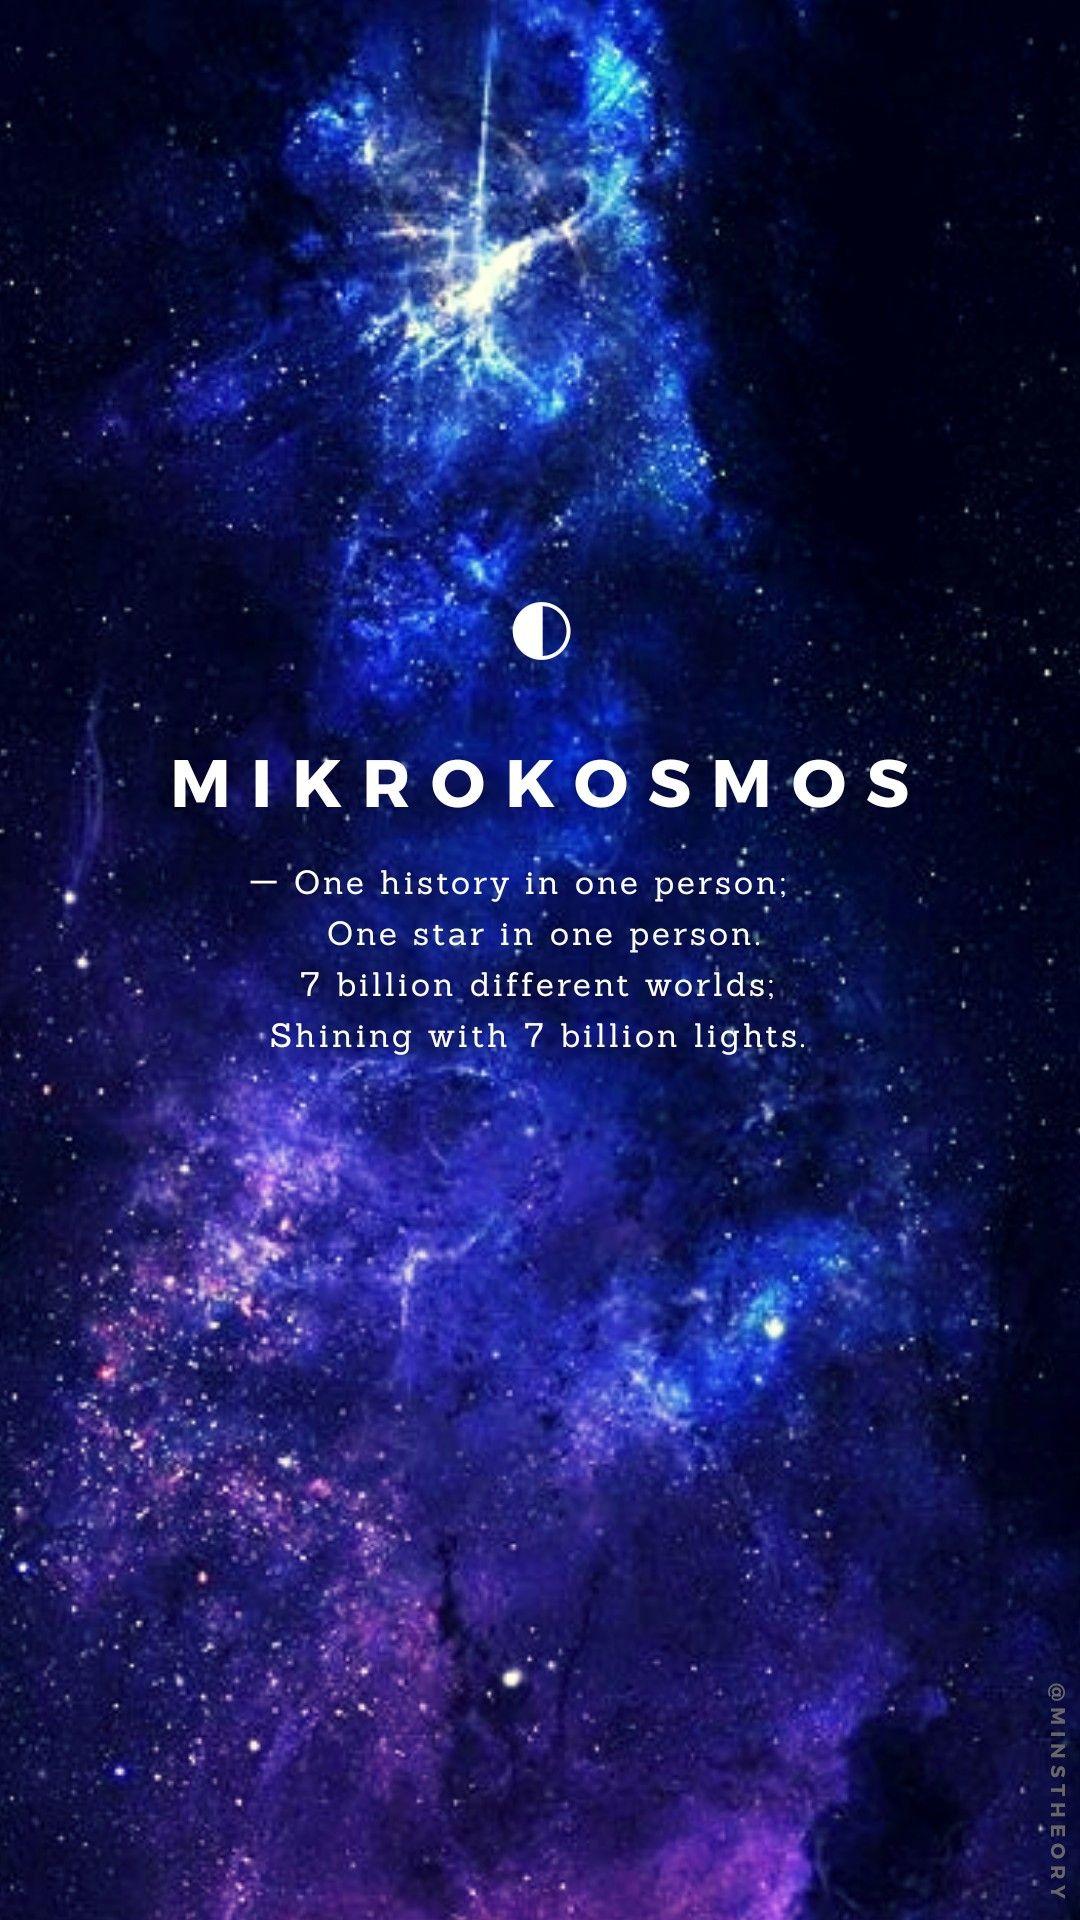 Mikrokosmos Bts Wallpaper Lyrics Bts Lyrics Quotes Bts Song Lyrics Bts mikrokosmos wallpaper desktop